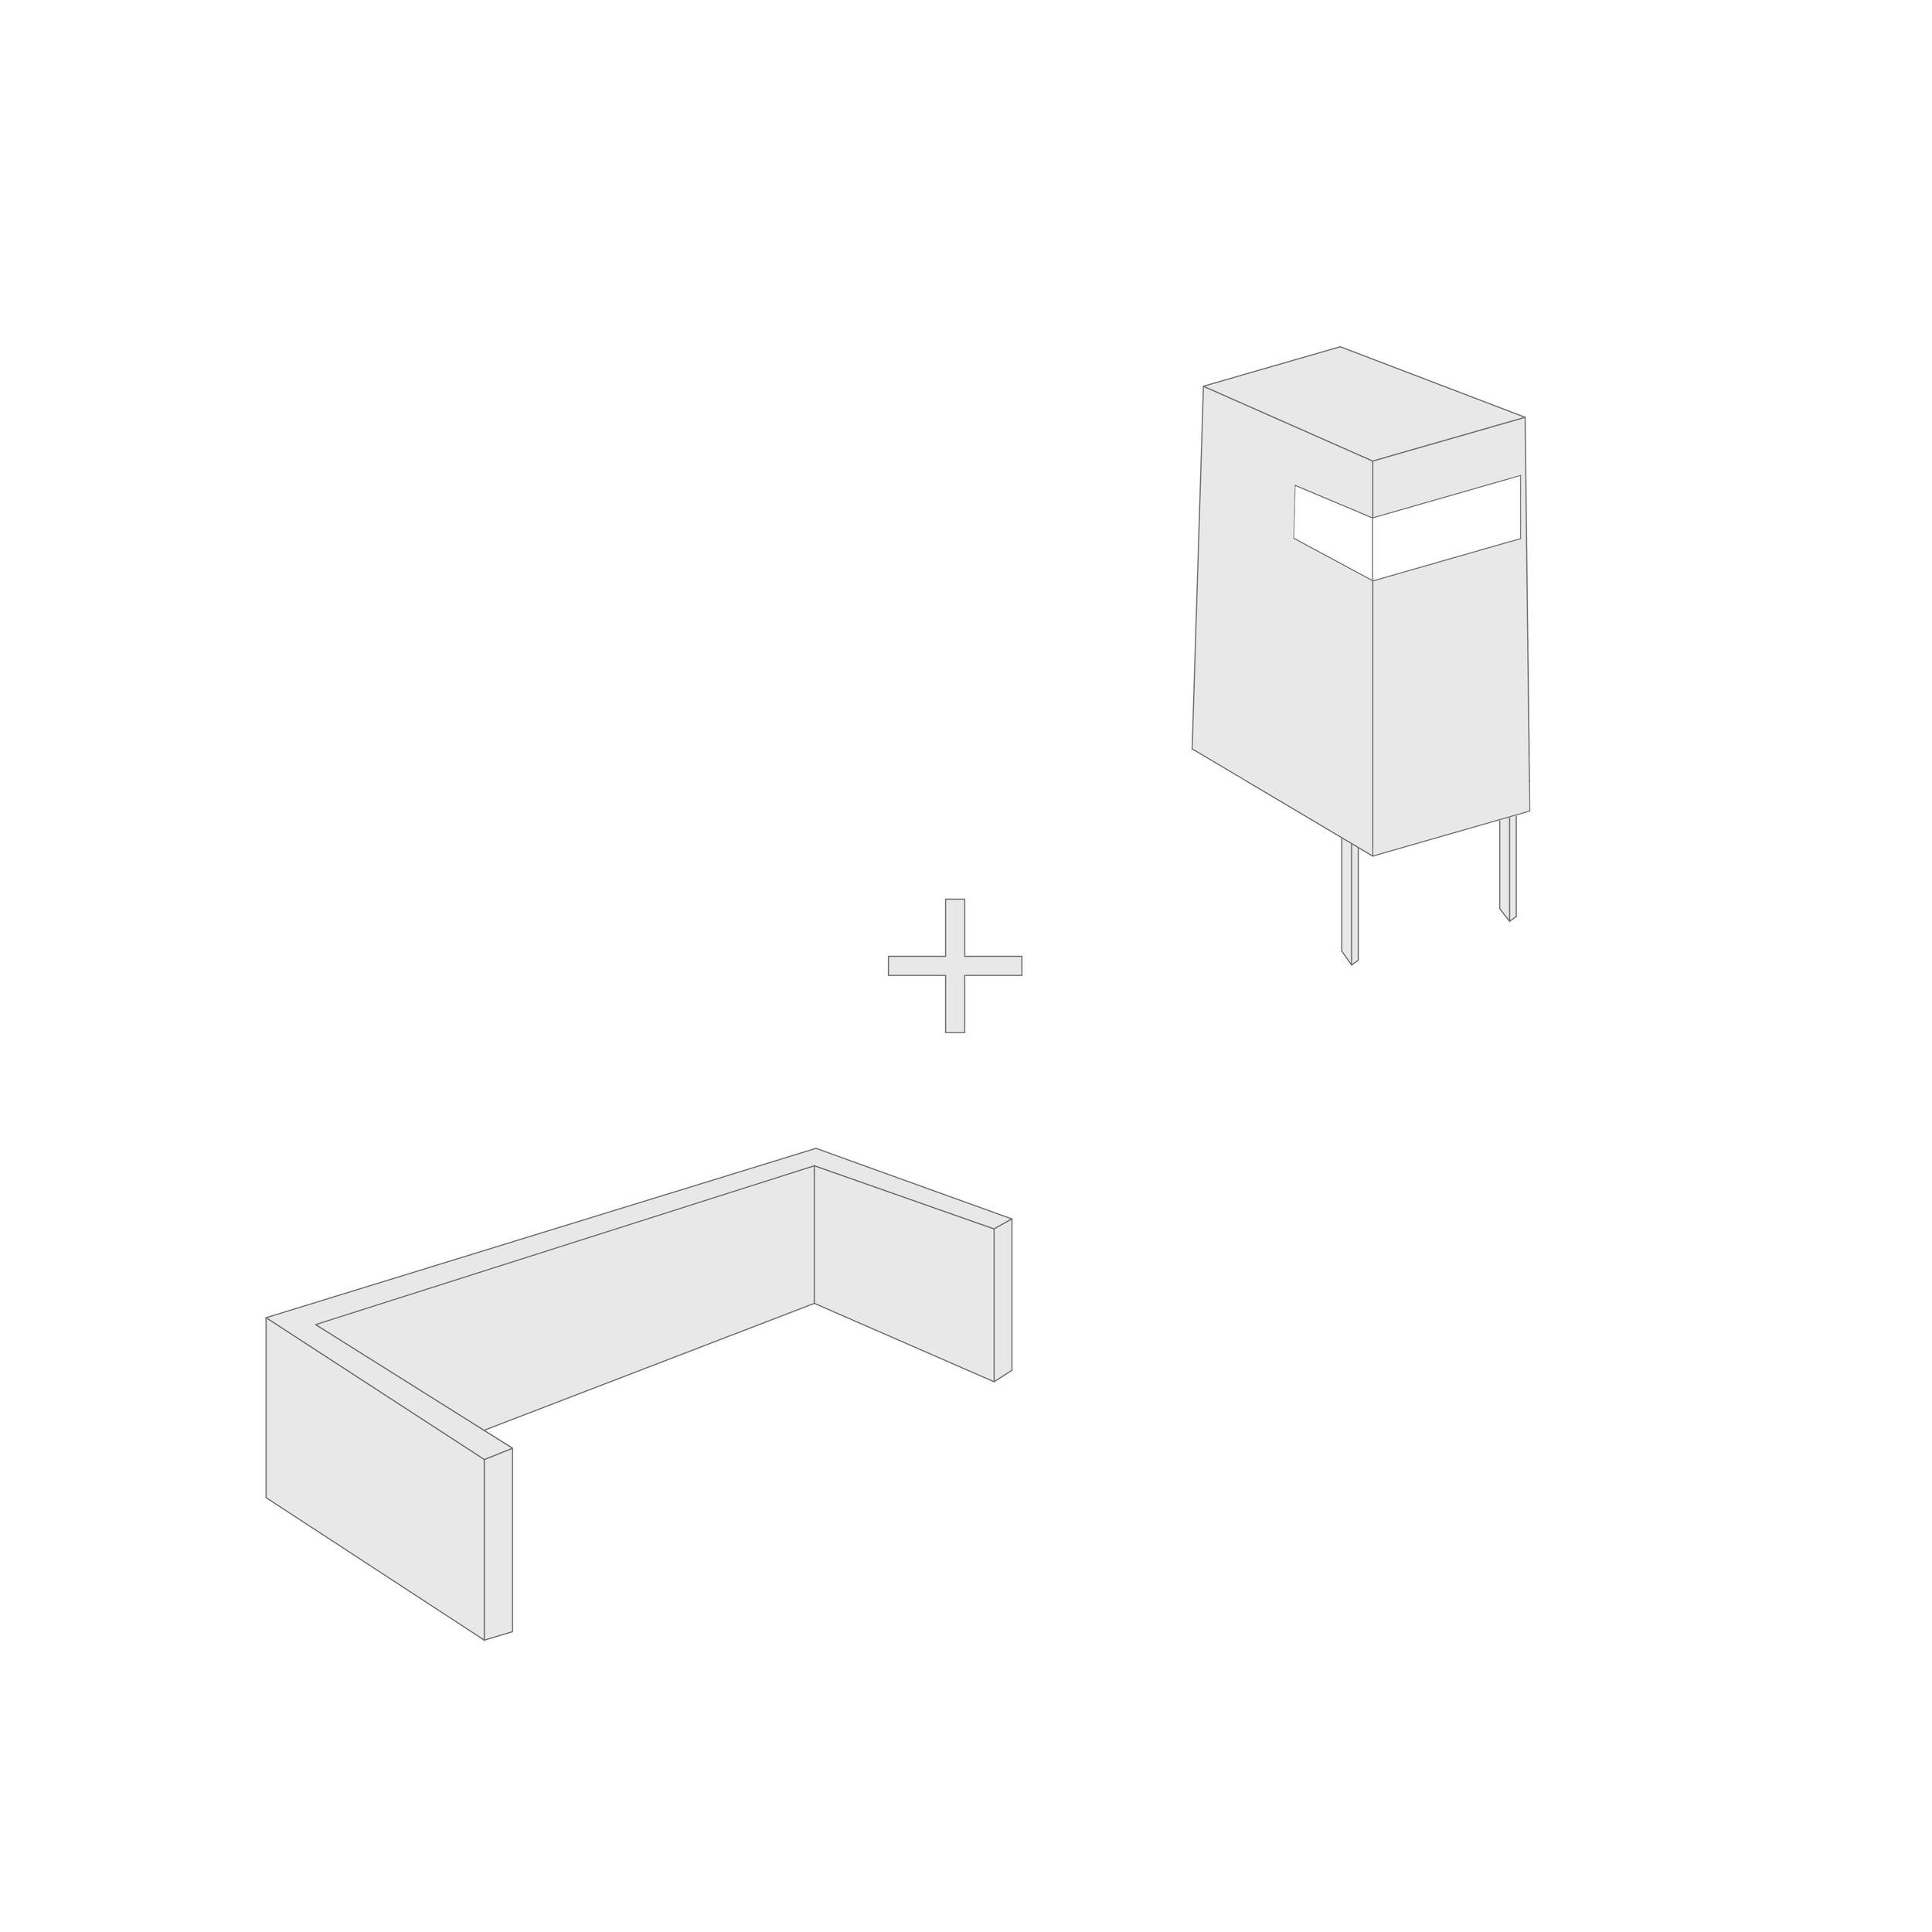 Christopher Beer Architect-Tower-Bunker-Concept.jpg